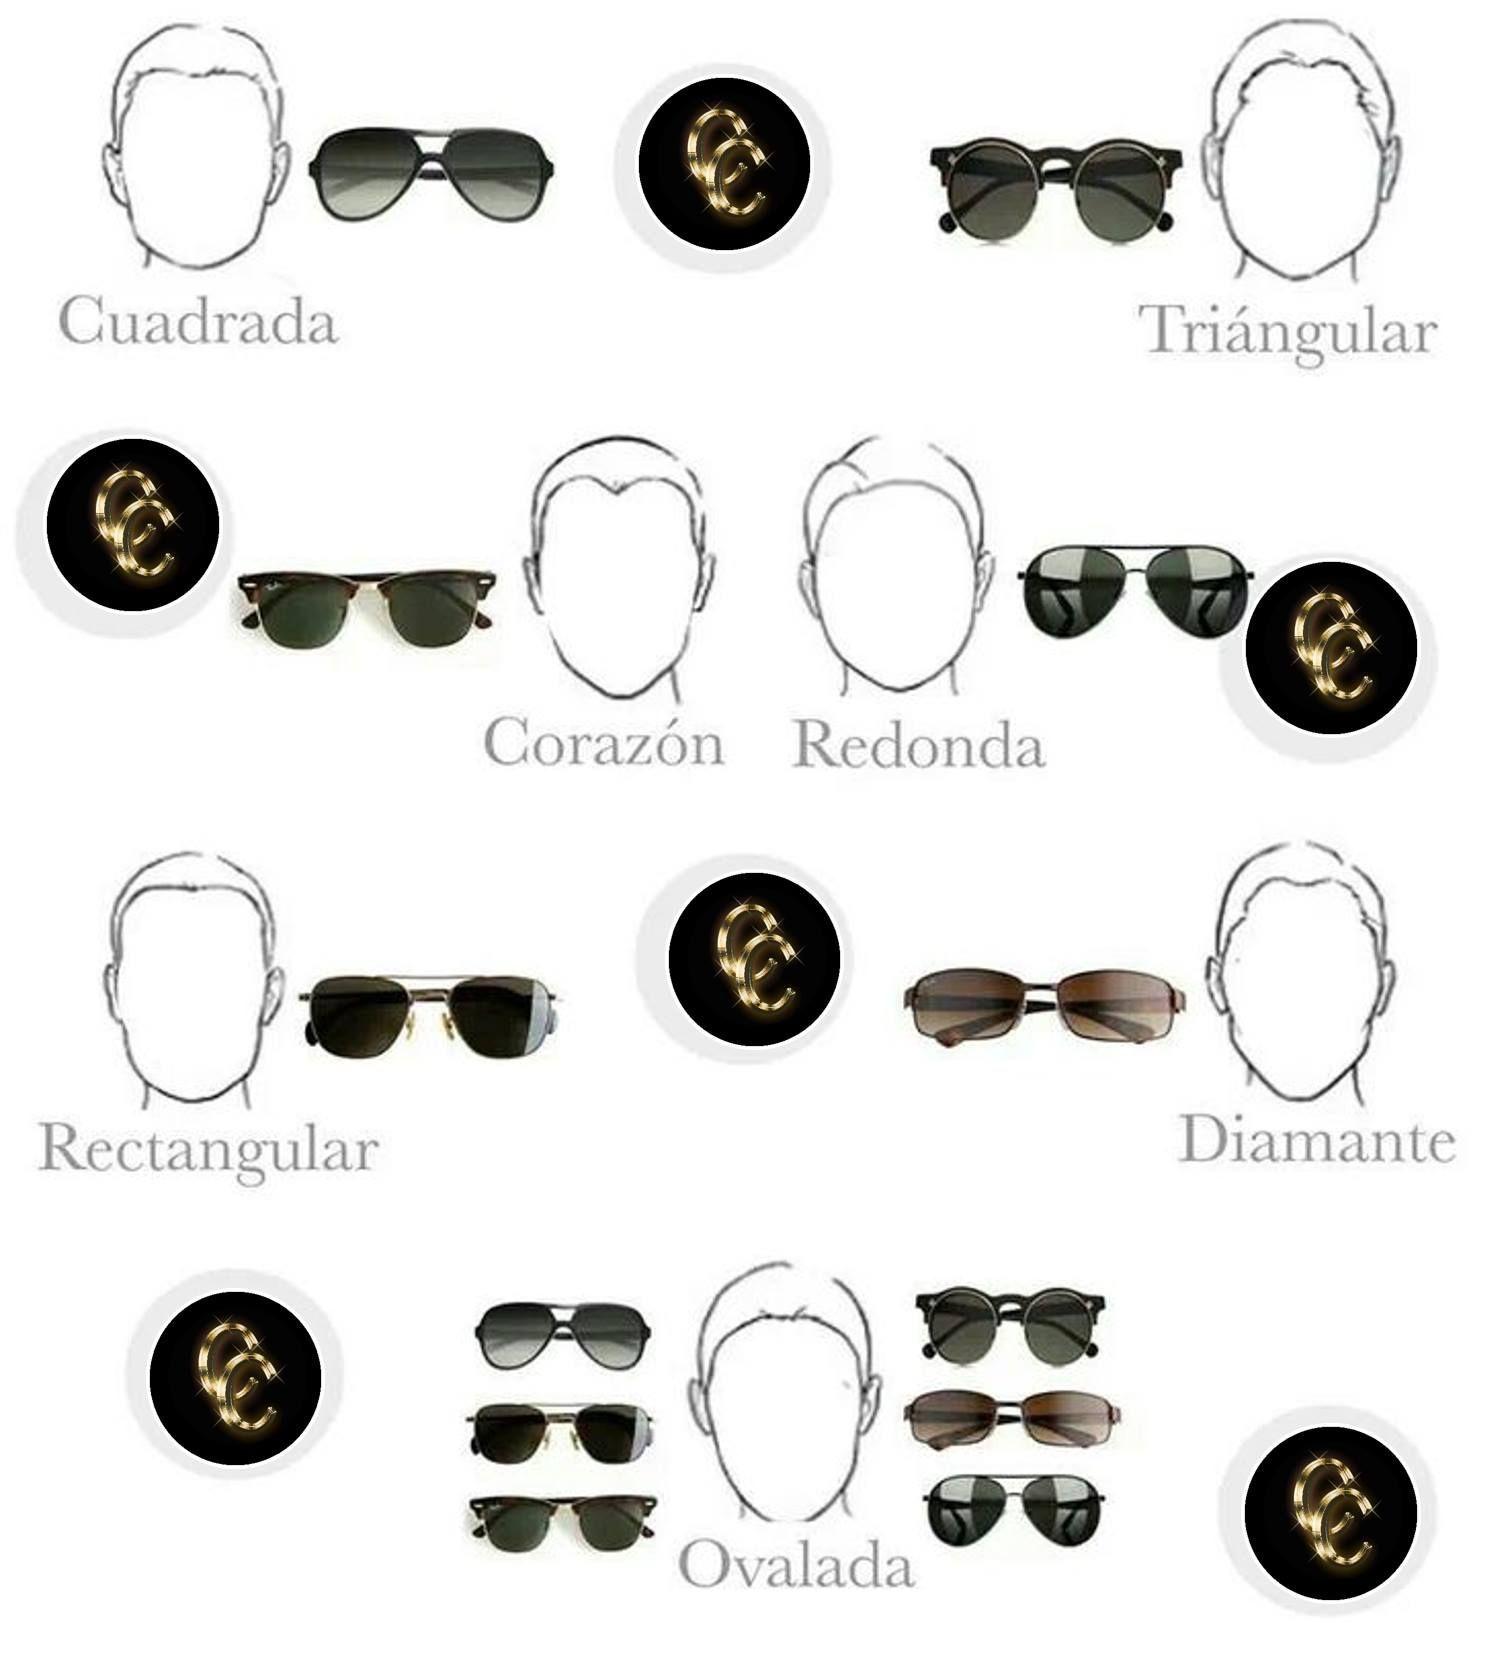 View 29 Gafas Para Un Hombre De Cara Redonda Mens Glasses Frames Face Shapes Mens Glasses Fashion Men Sunglasses Fashion